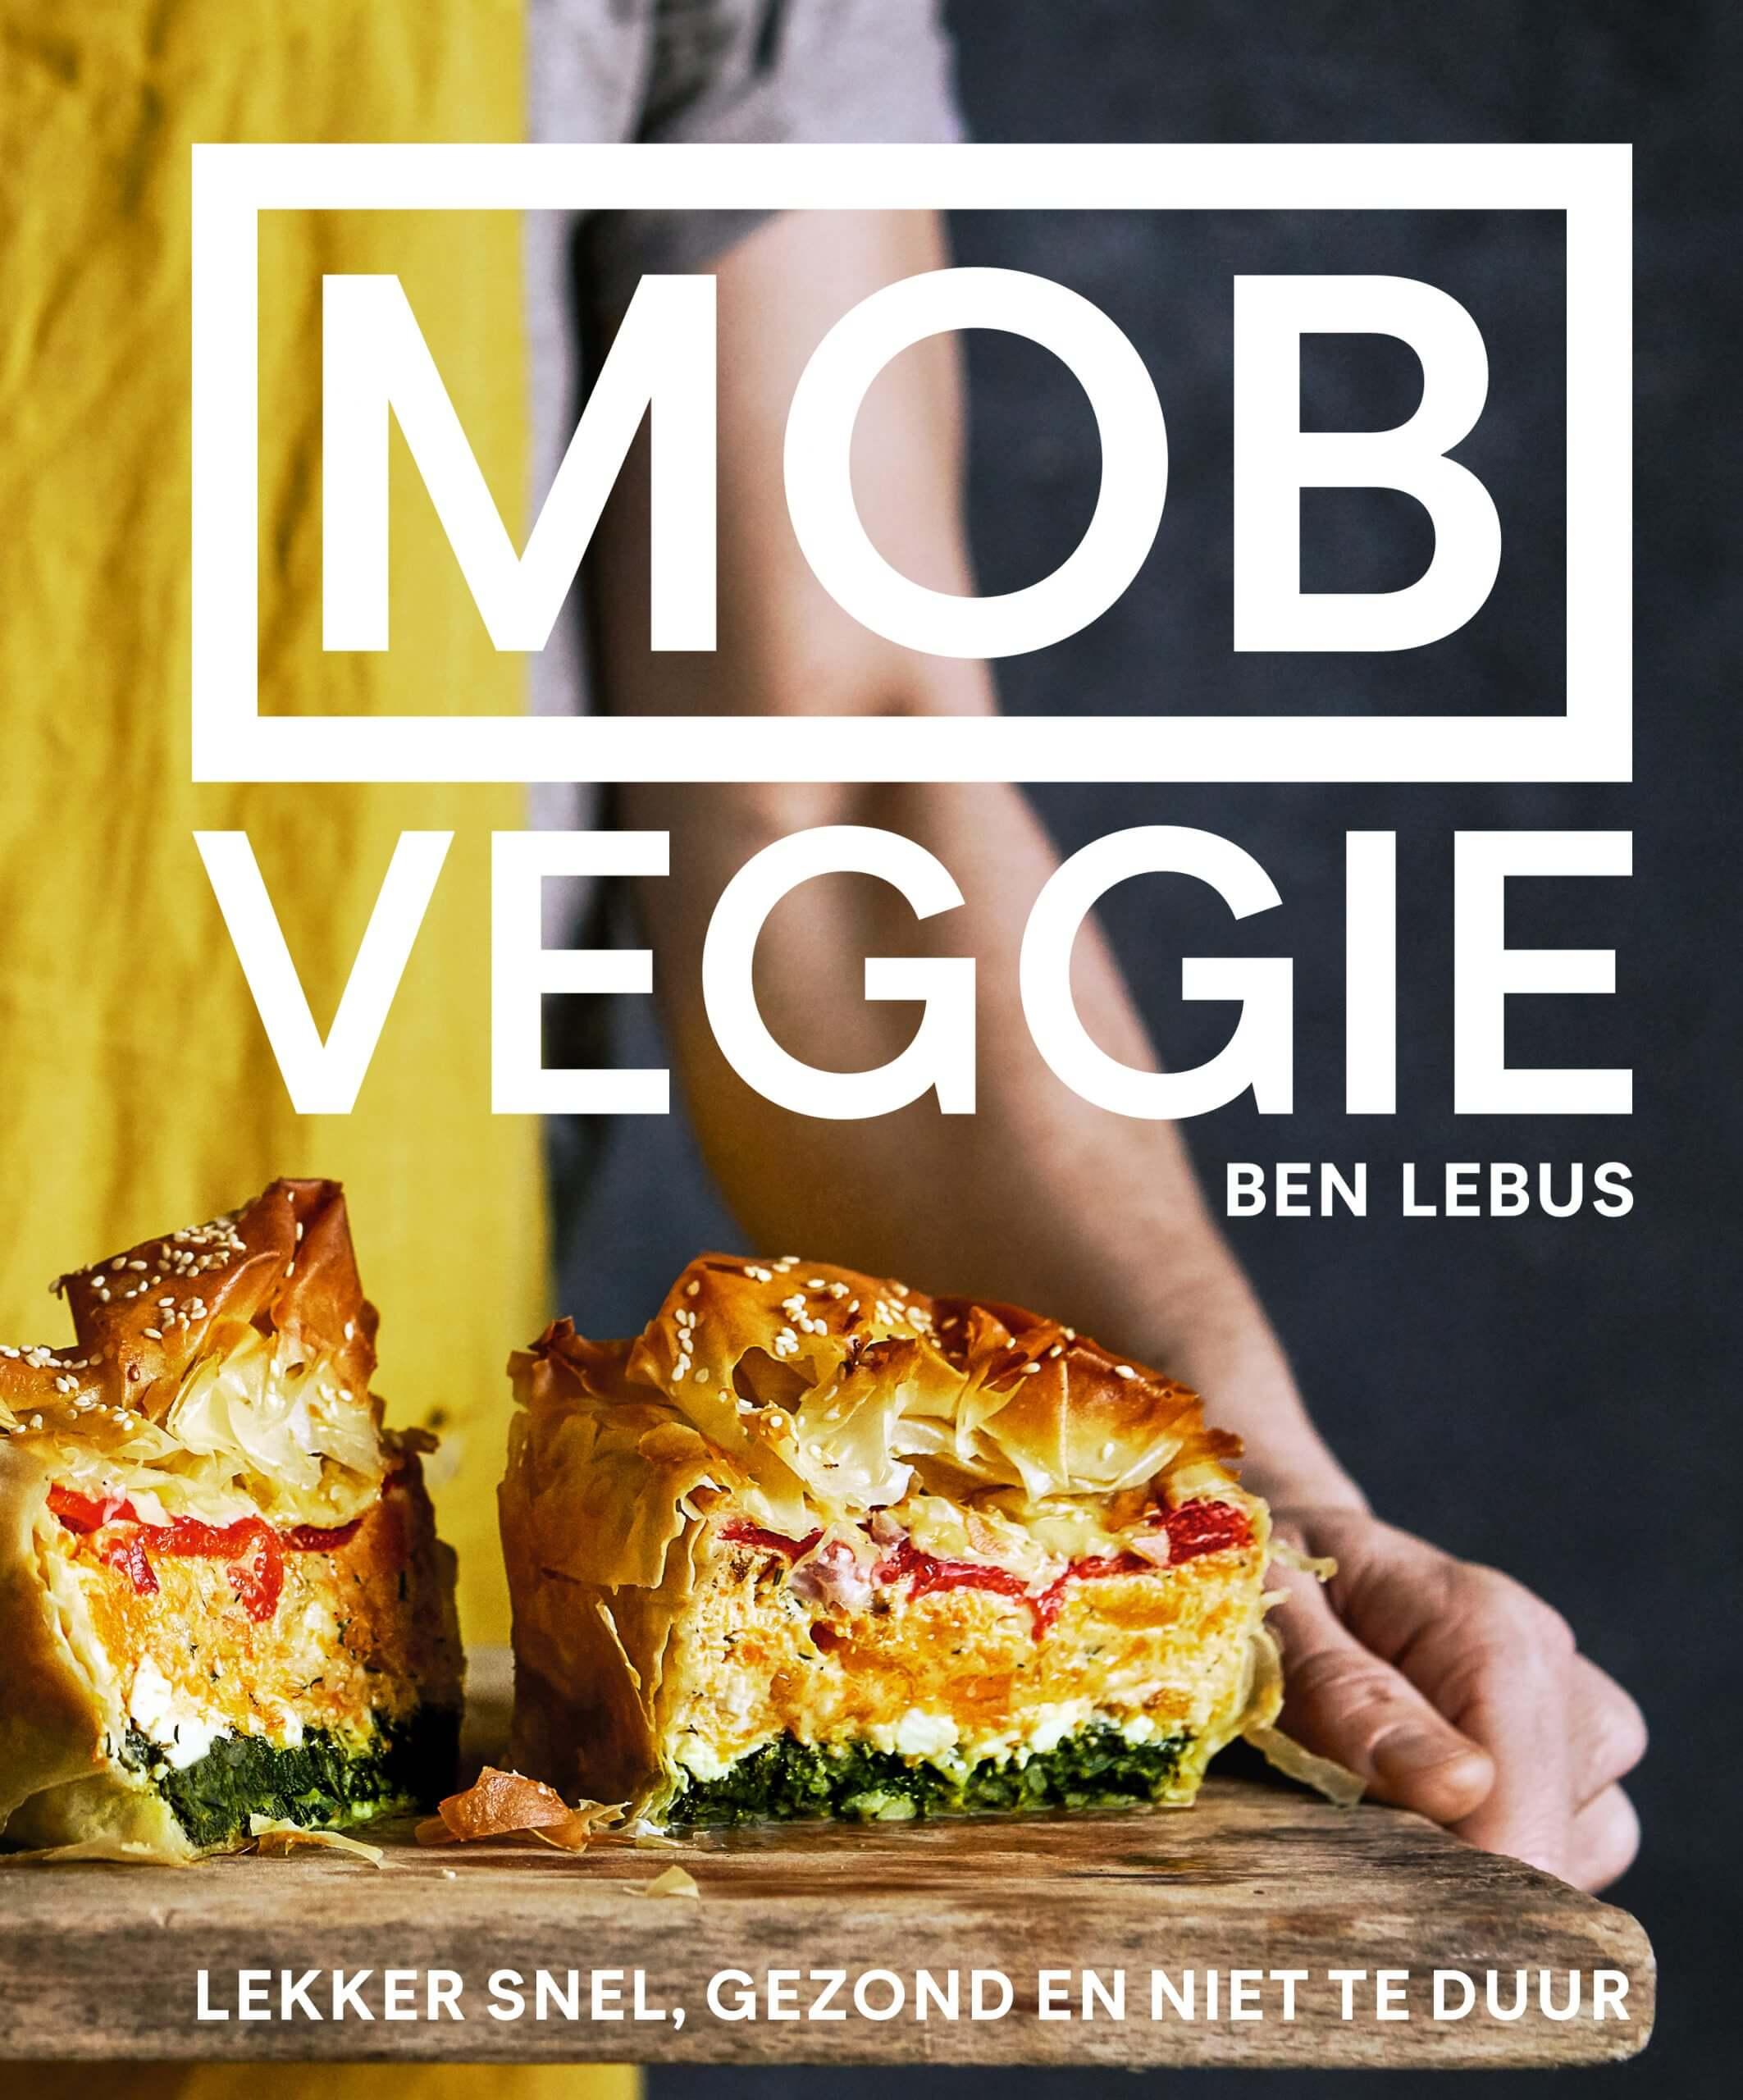 Koookboek review: MOB veggie van Ben Lebus